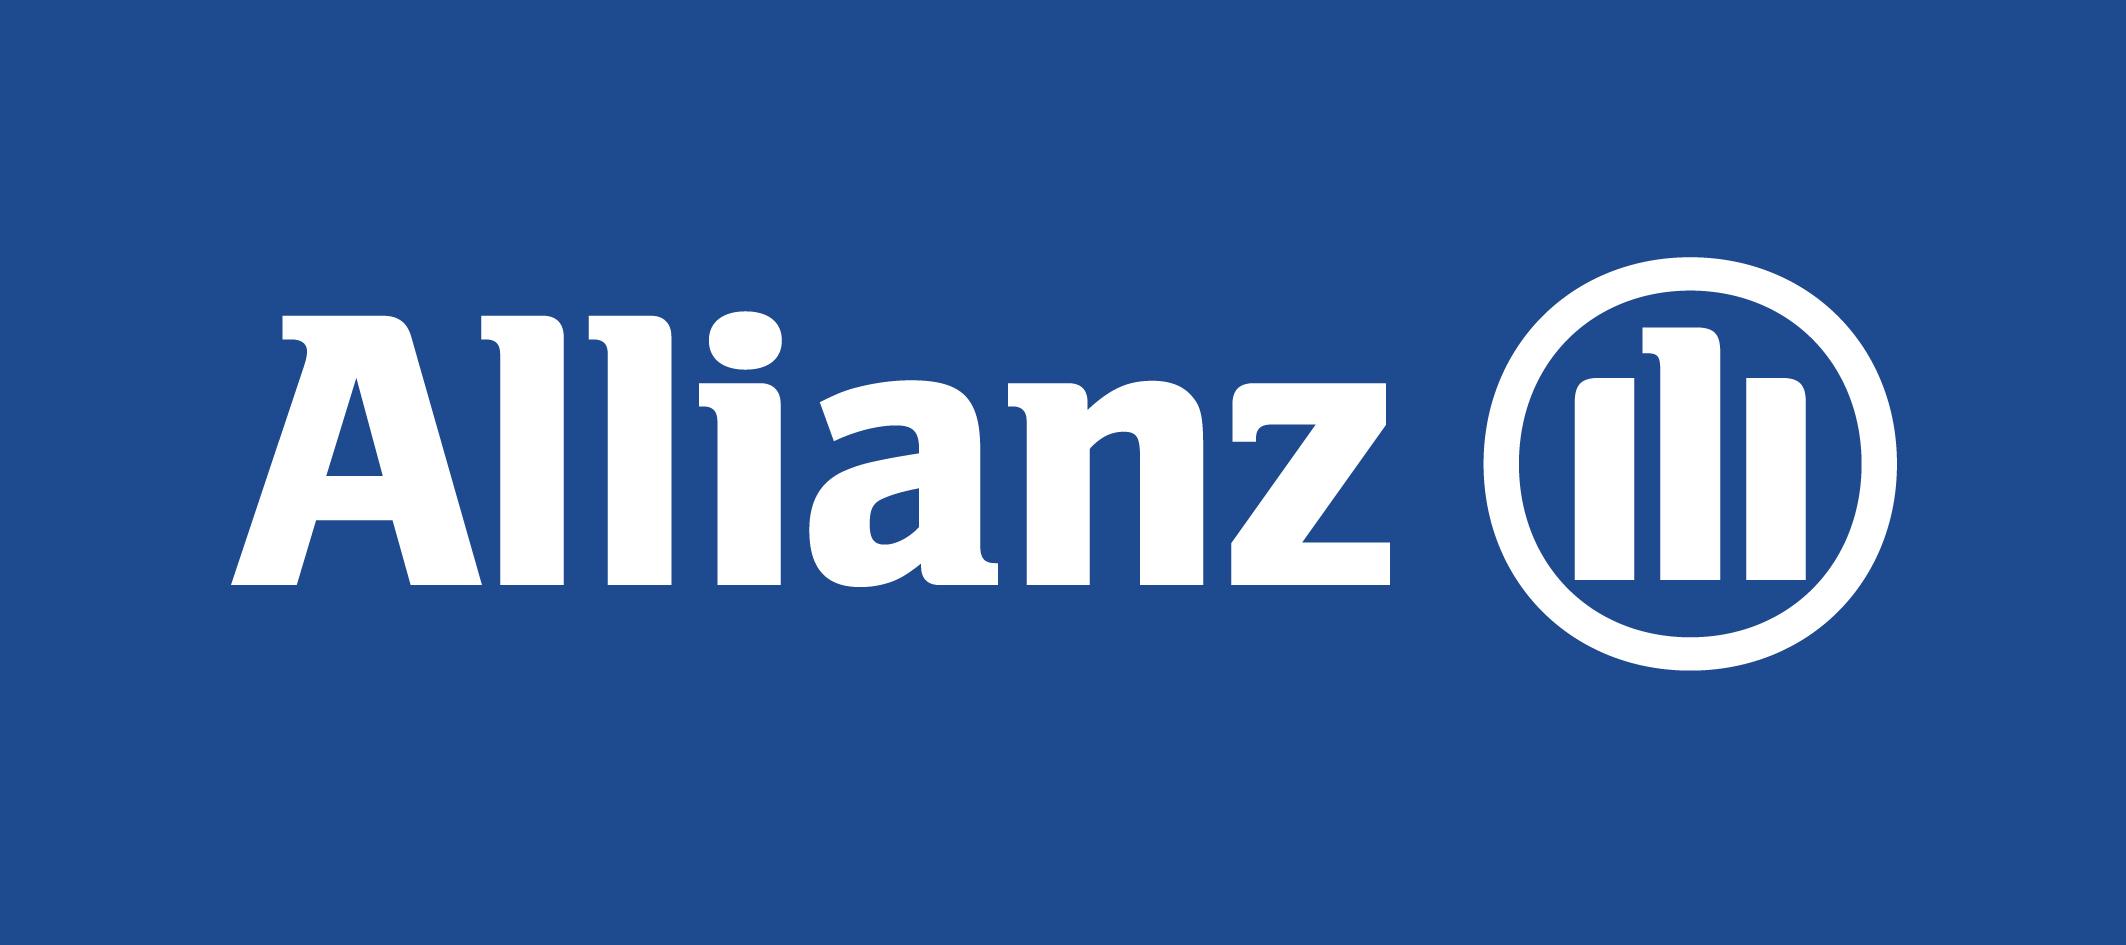 AZ_Logo_PMS_287c.jpg